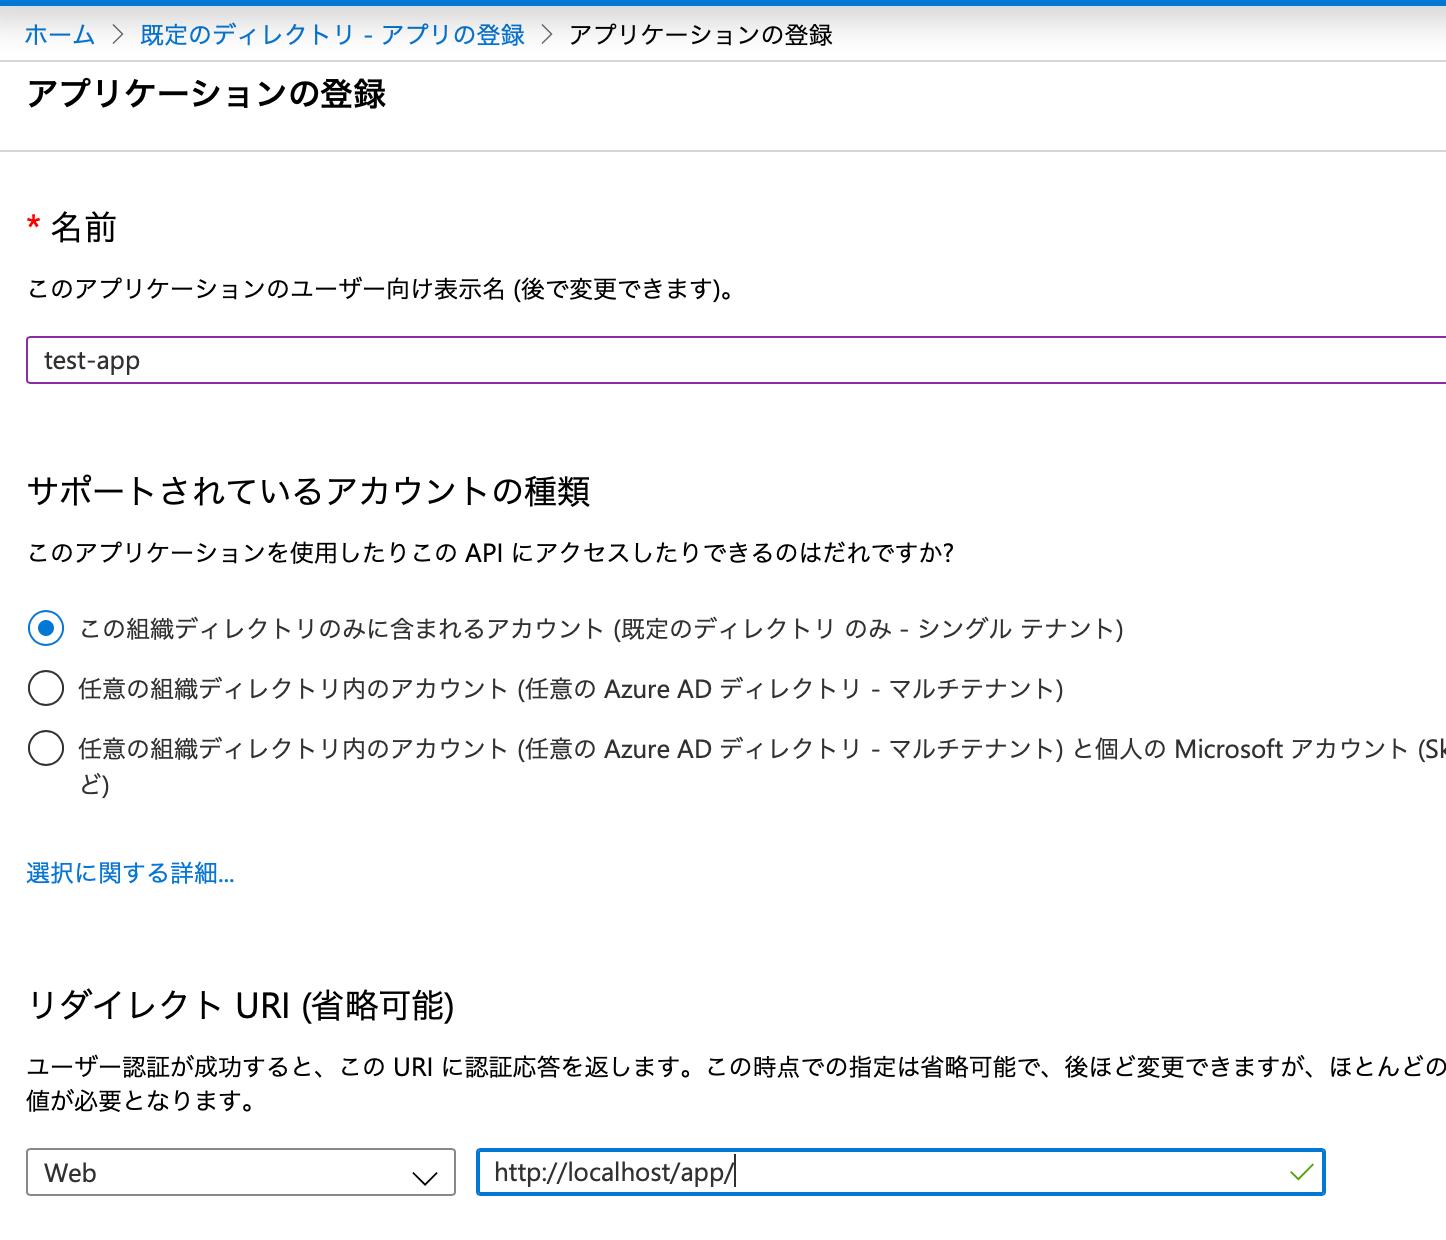 azure_new_app.png